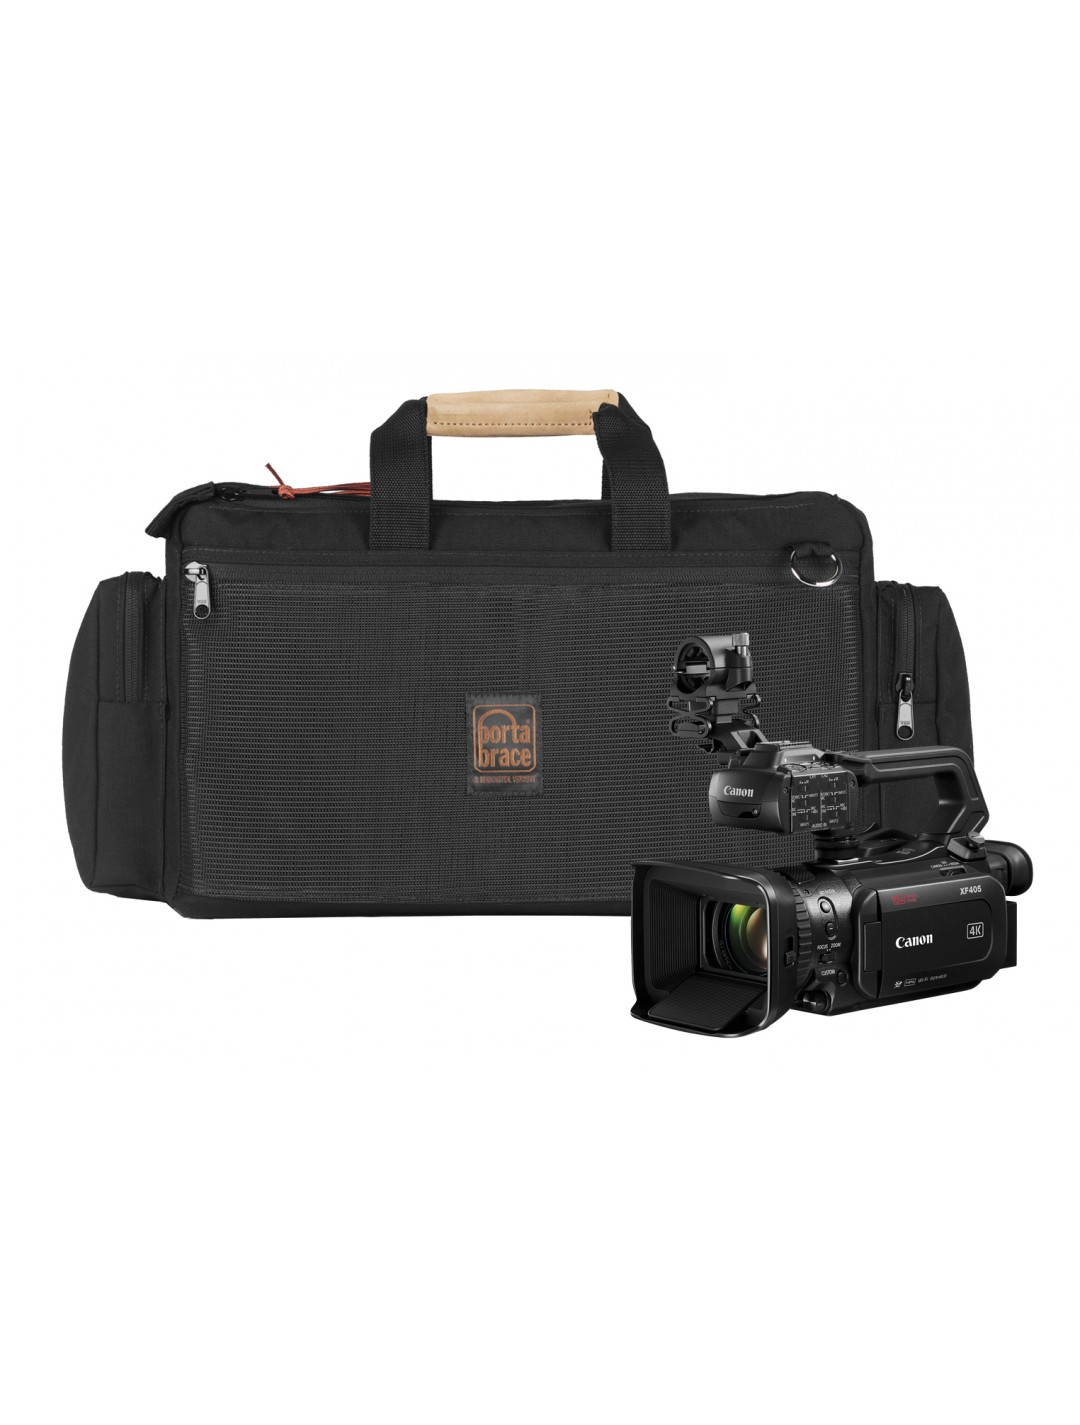 Porta Brace CAR-XF405 Saco de Transporte, para Canon XF405, Preto